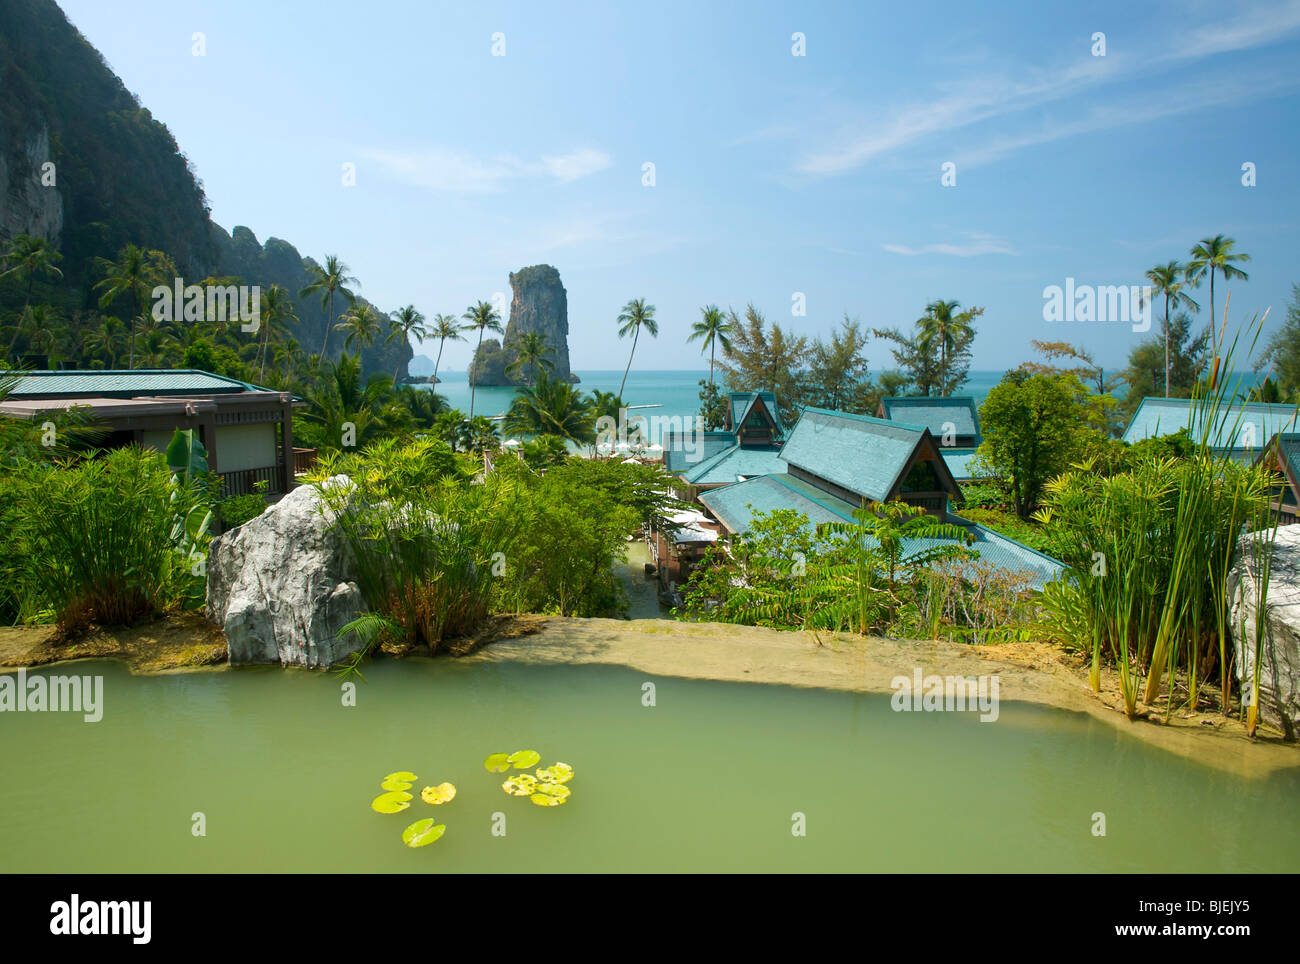 Centara Resort, Krabi, Thailand Stock Photo